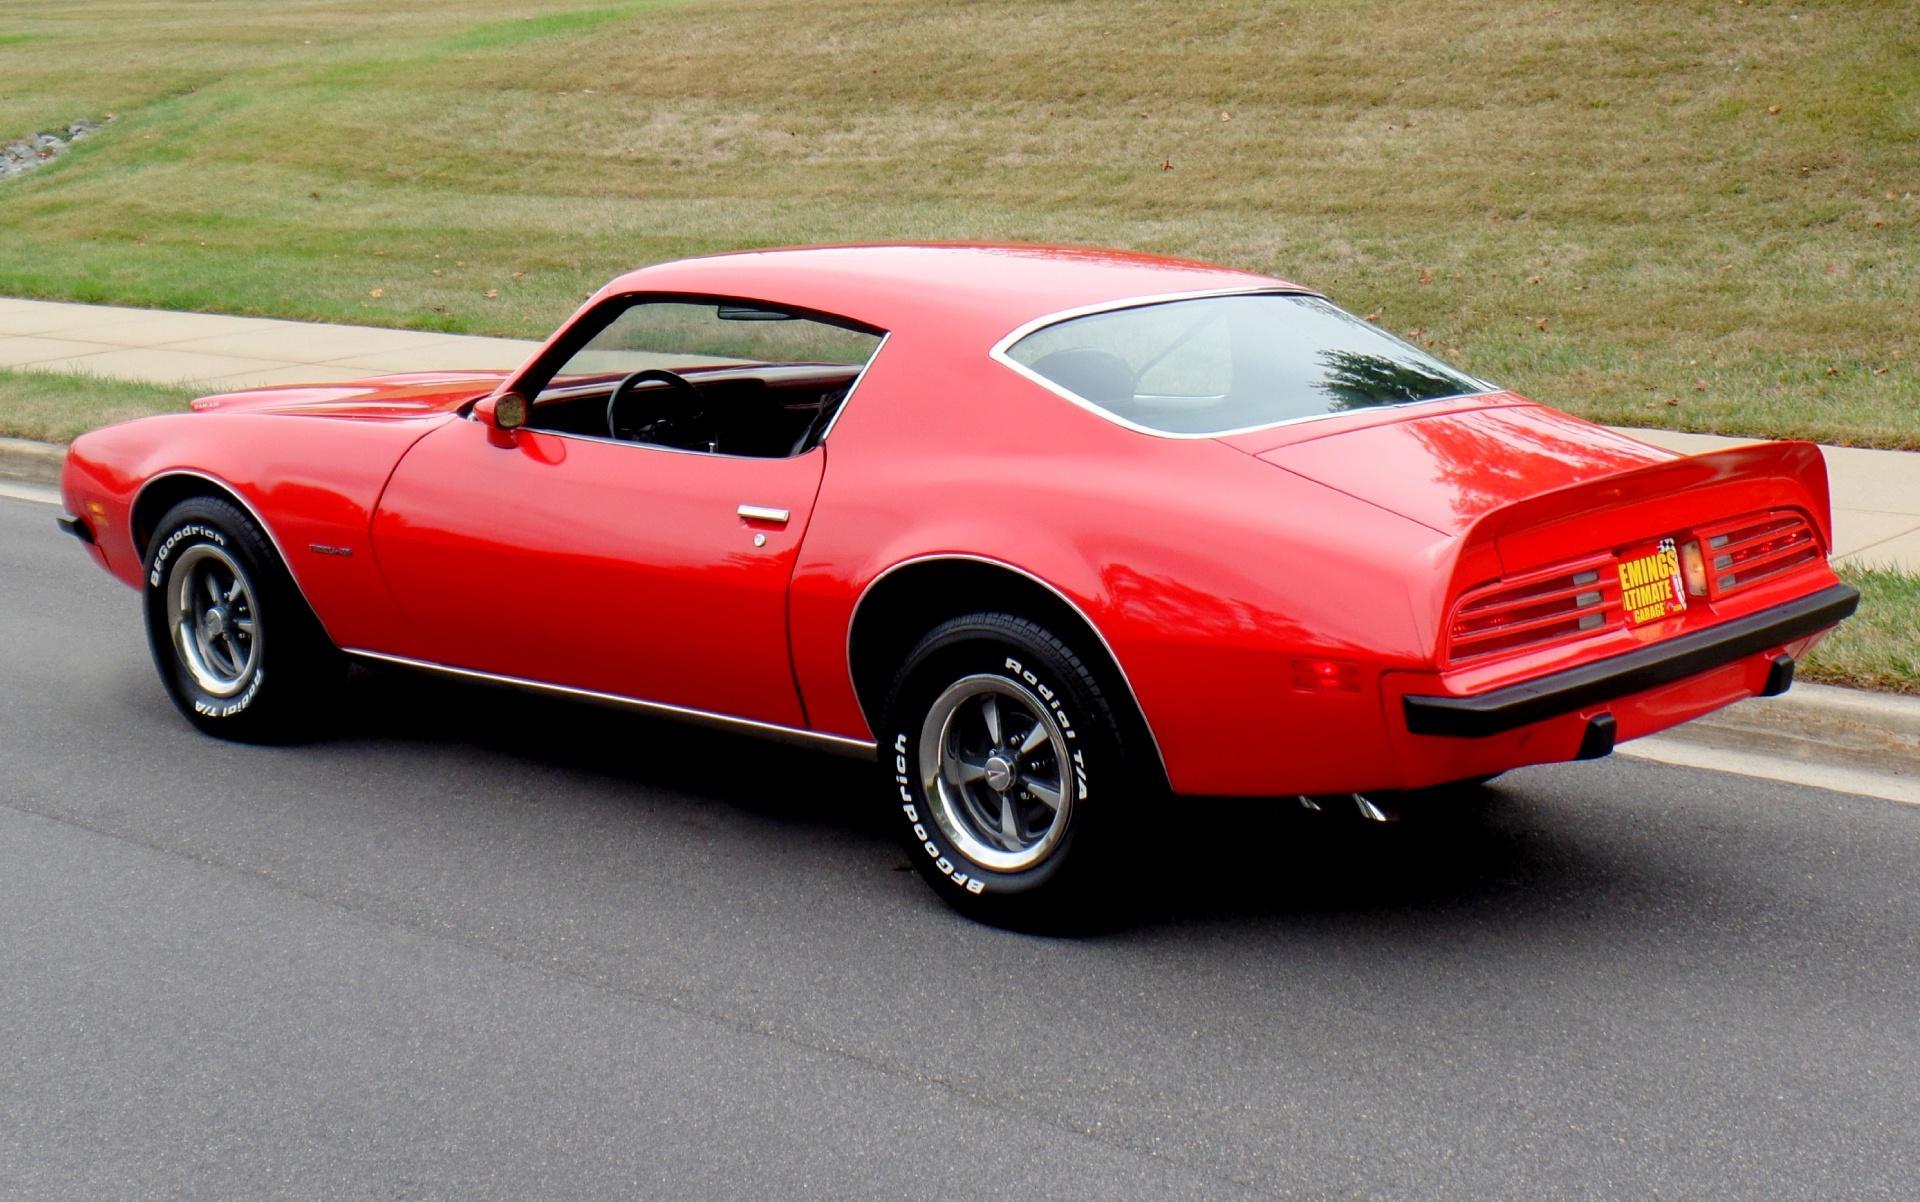 1974 Firebird Formula Ram Air : Pontiac firebird formula with rare factory ram air